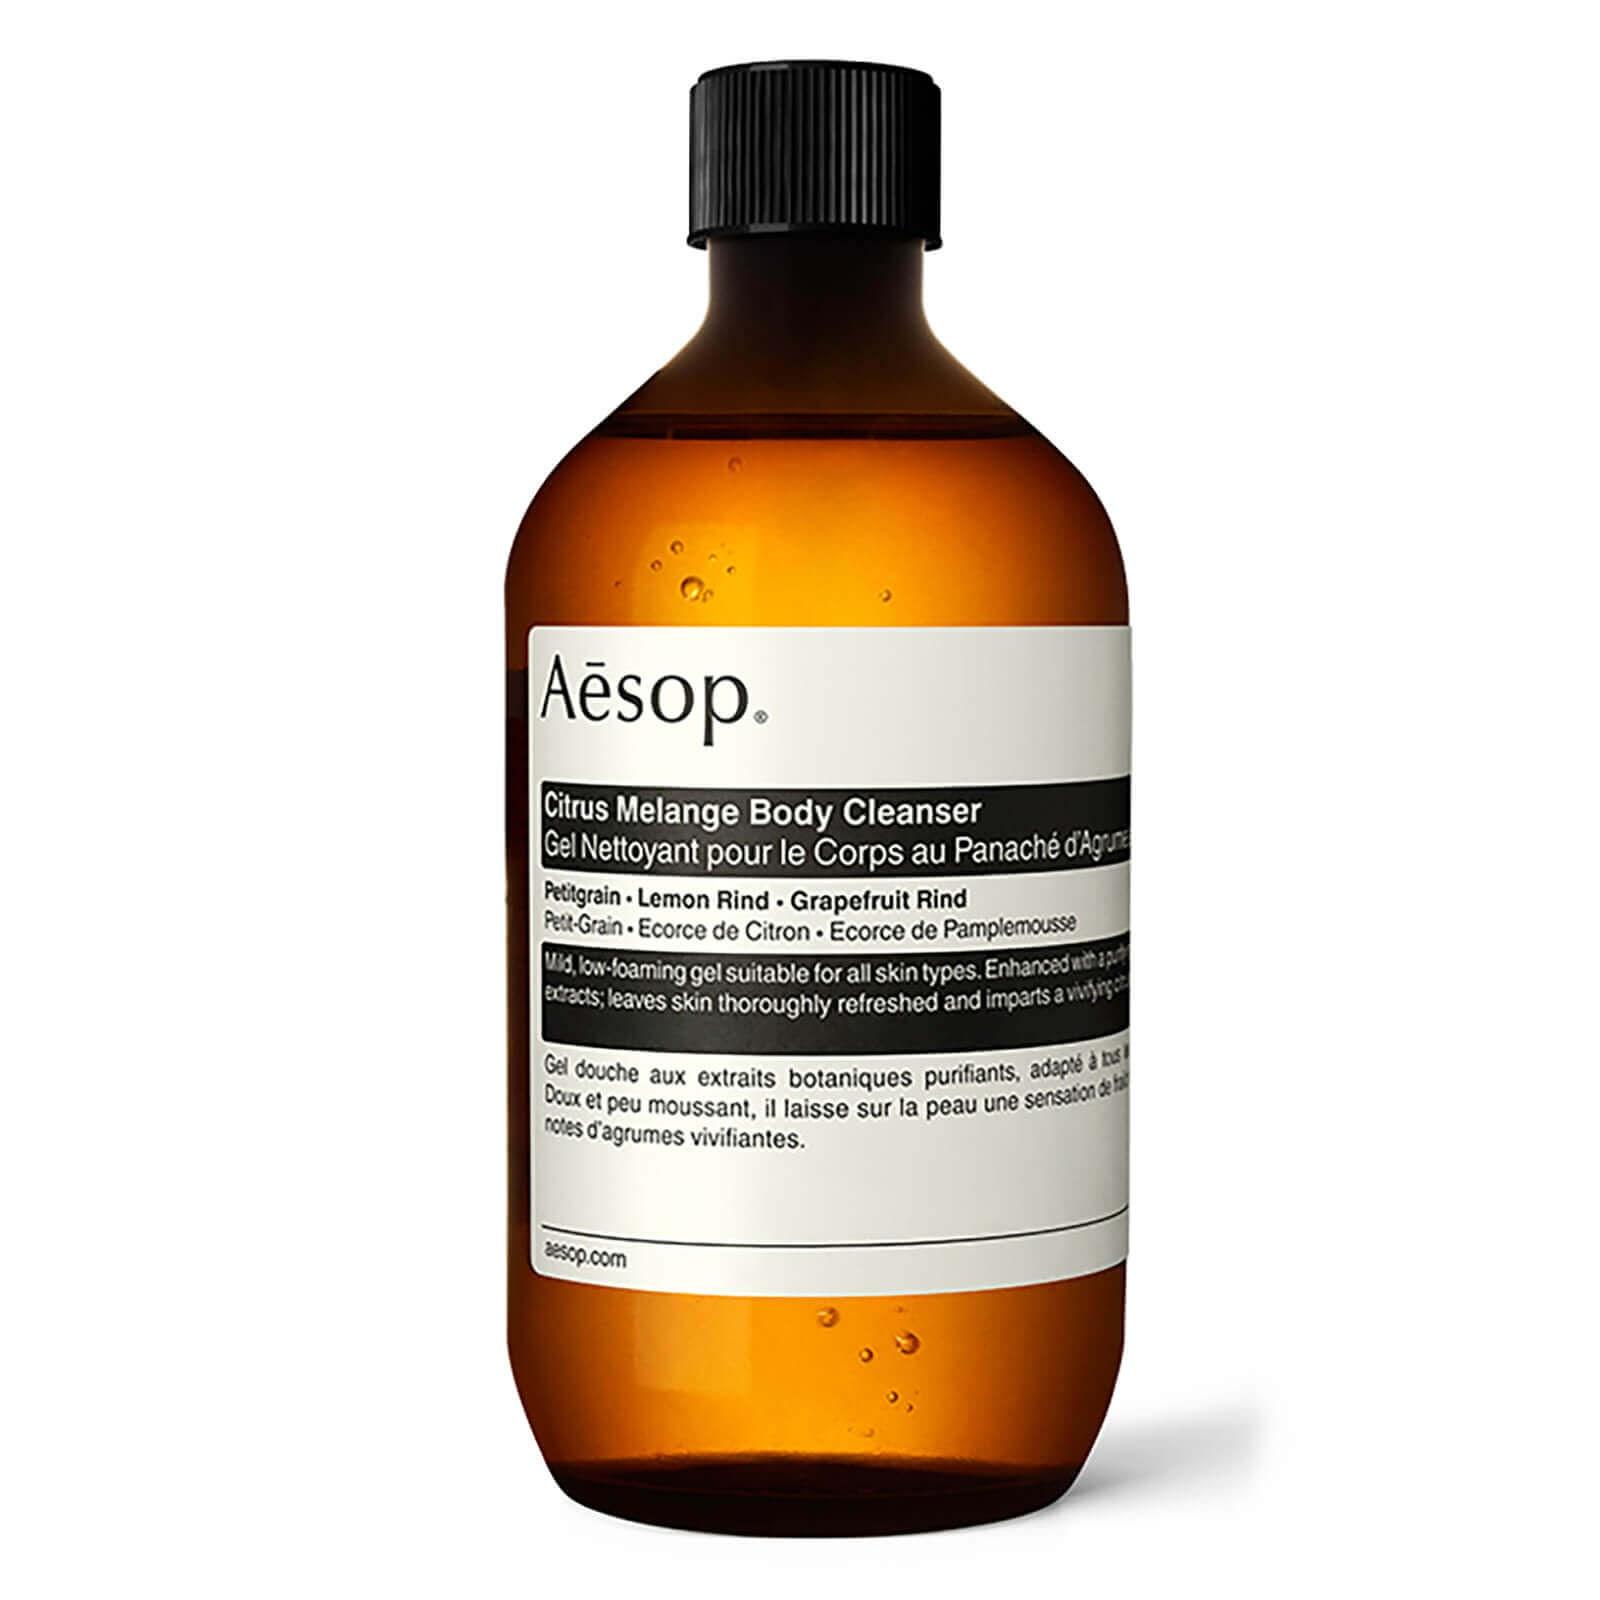 Aesop Citrus Melange Body Cleanser